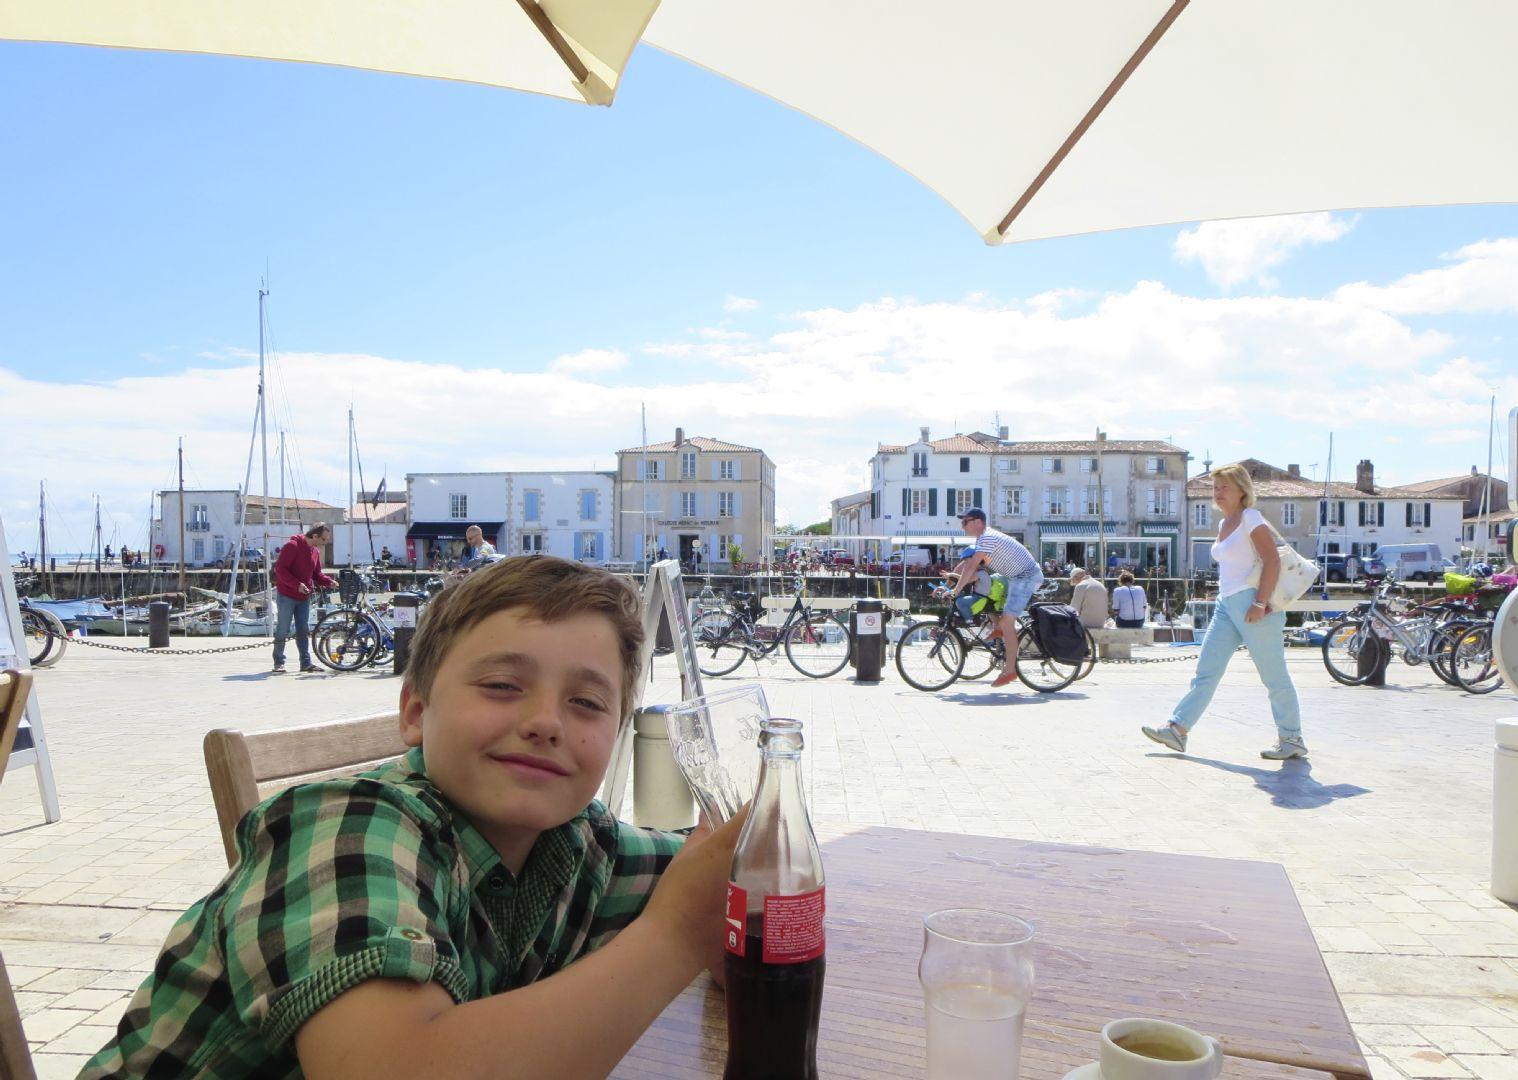 IMG_0176.jpg - France - Ile de Ré and the Atlantic Coast - Family Cycling